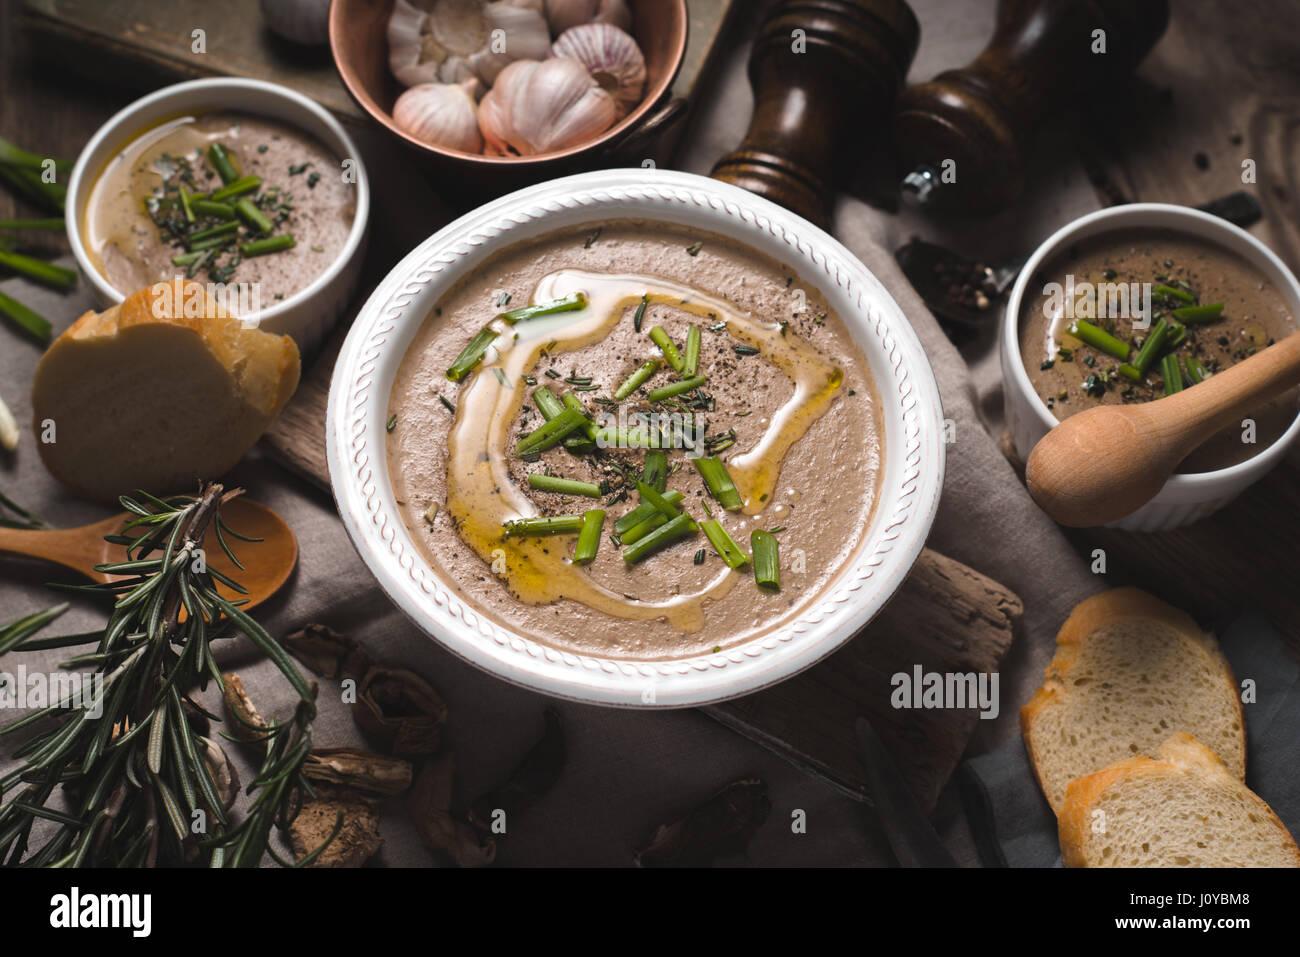 Mushroom soup puree in ceramic bowls top view - Stock Image